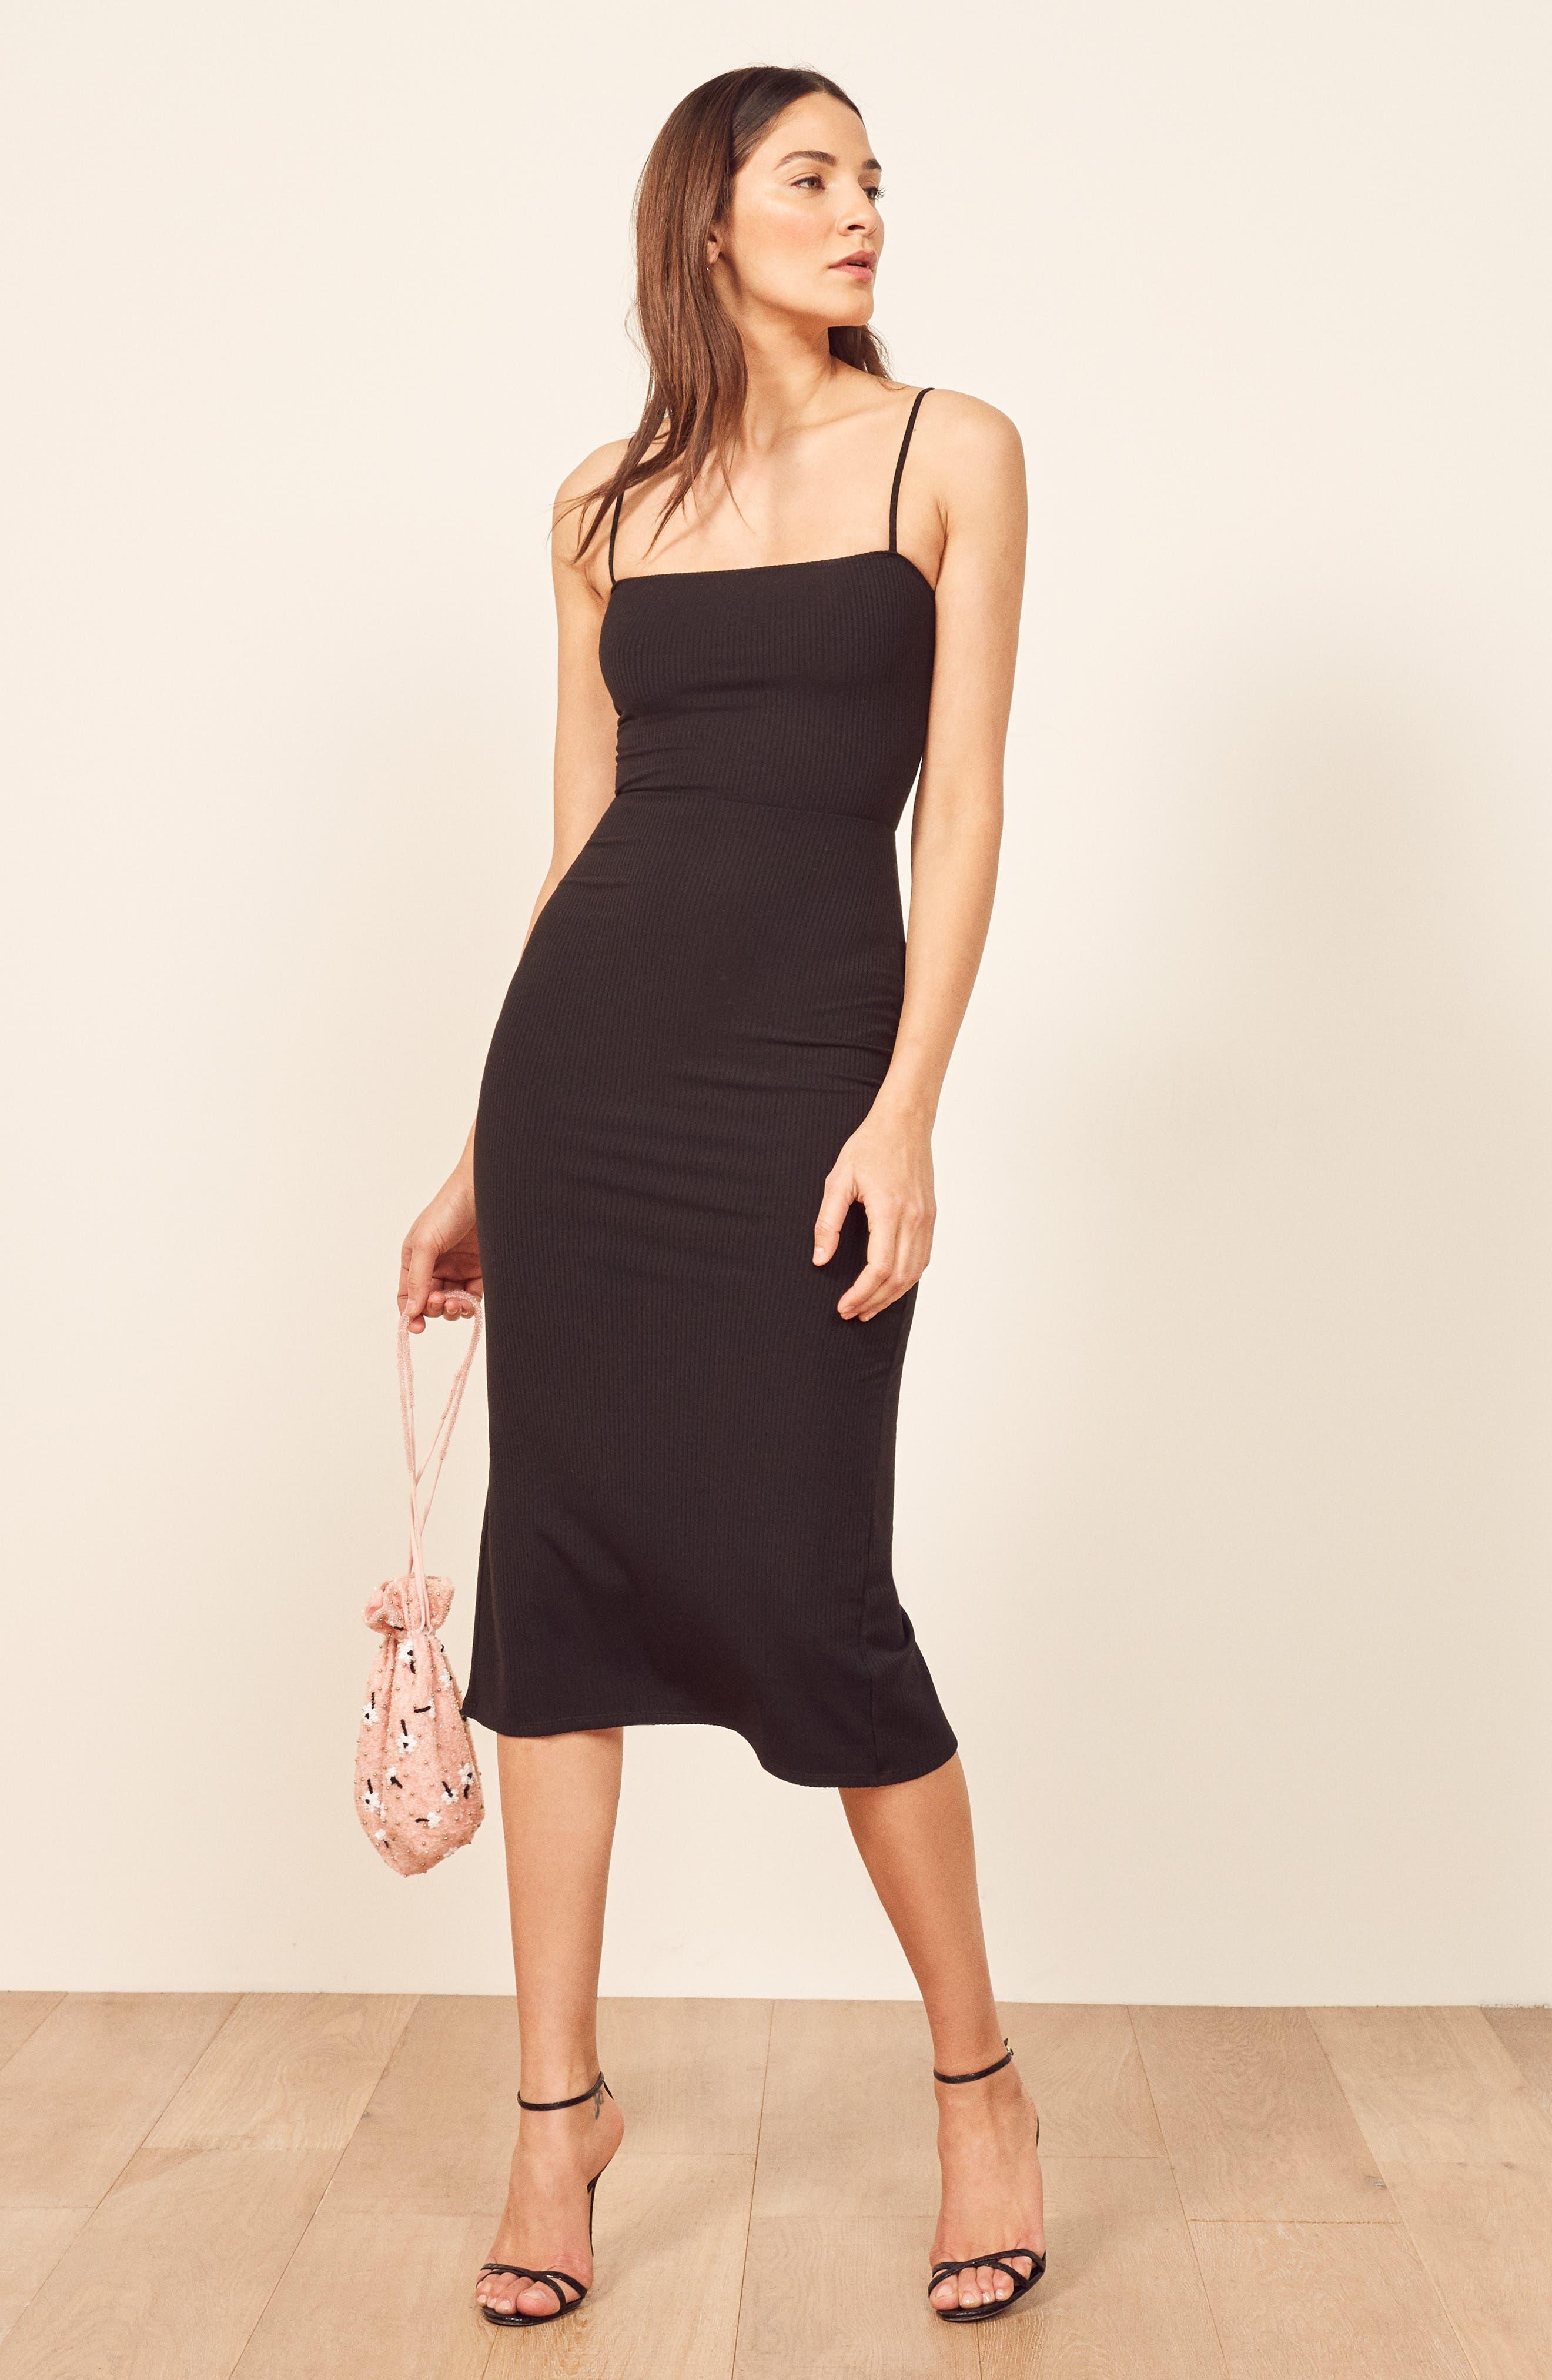 REFORMATION, Haley Midi Dress, Alternate thumbnail 6, color, BLACK